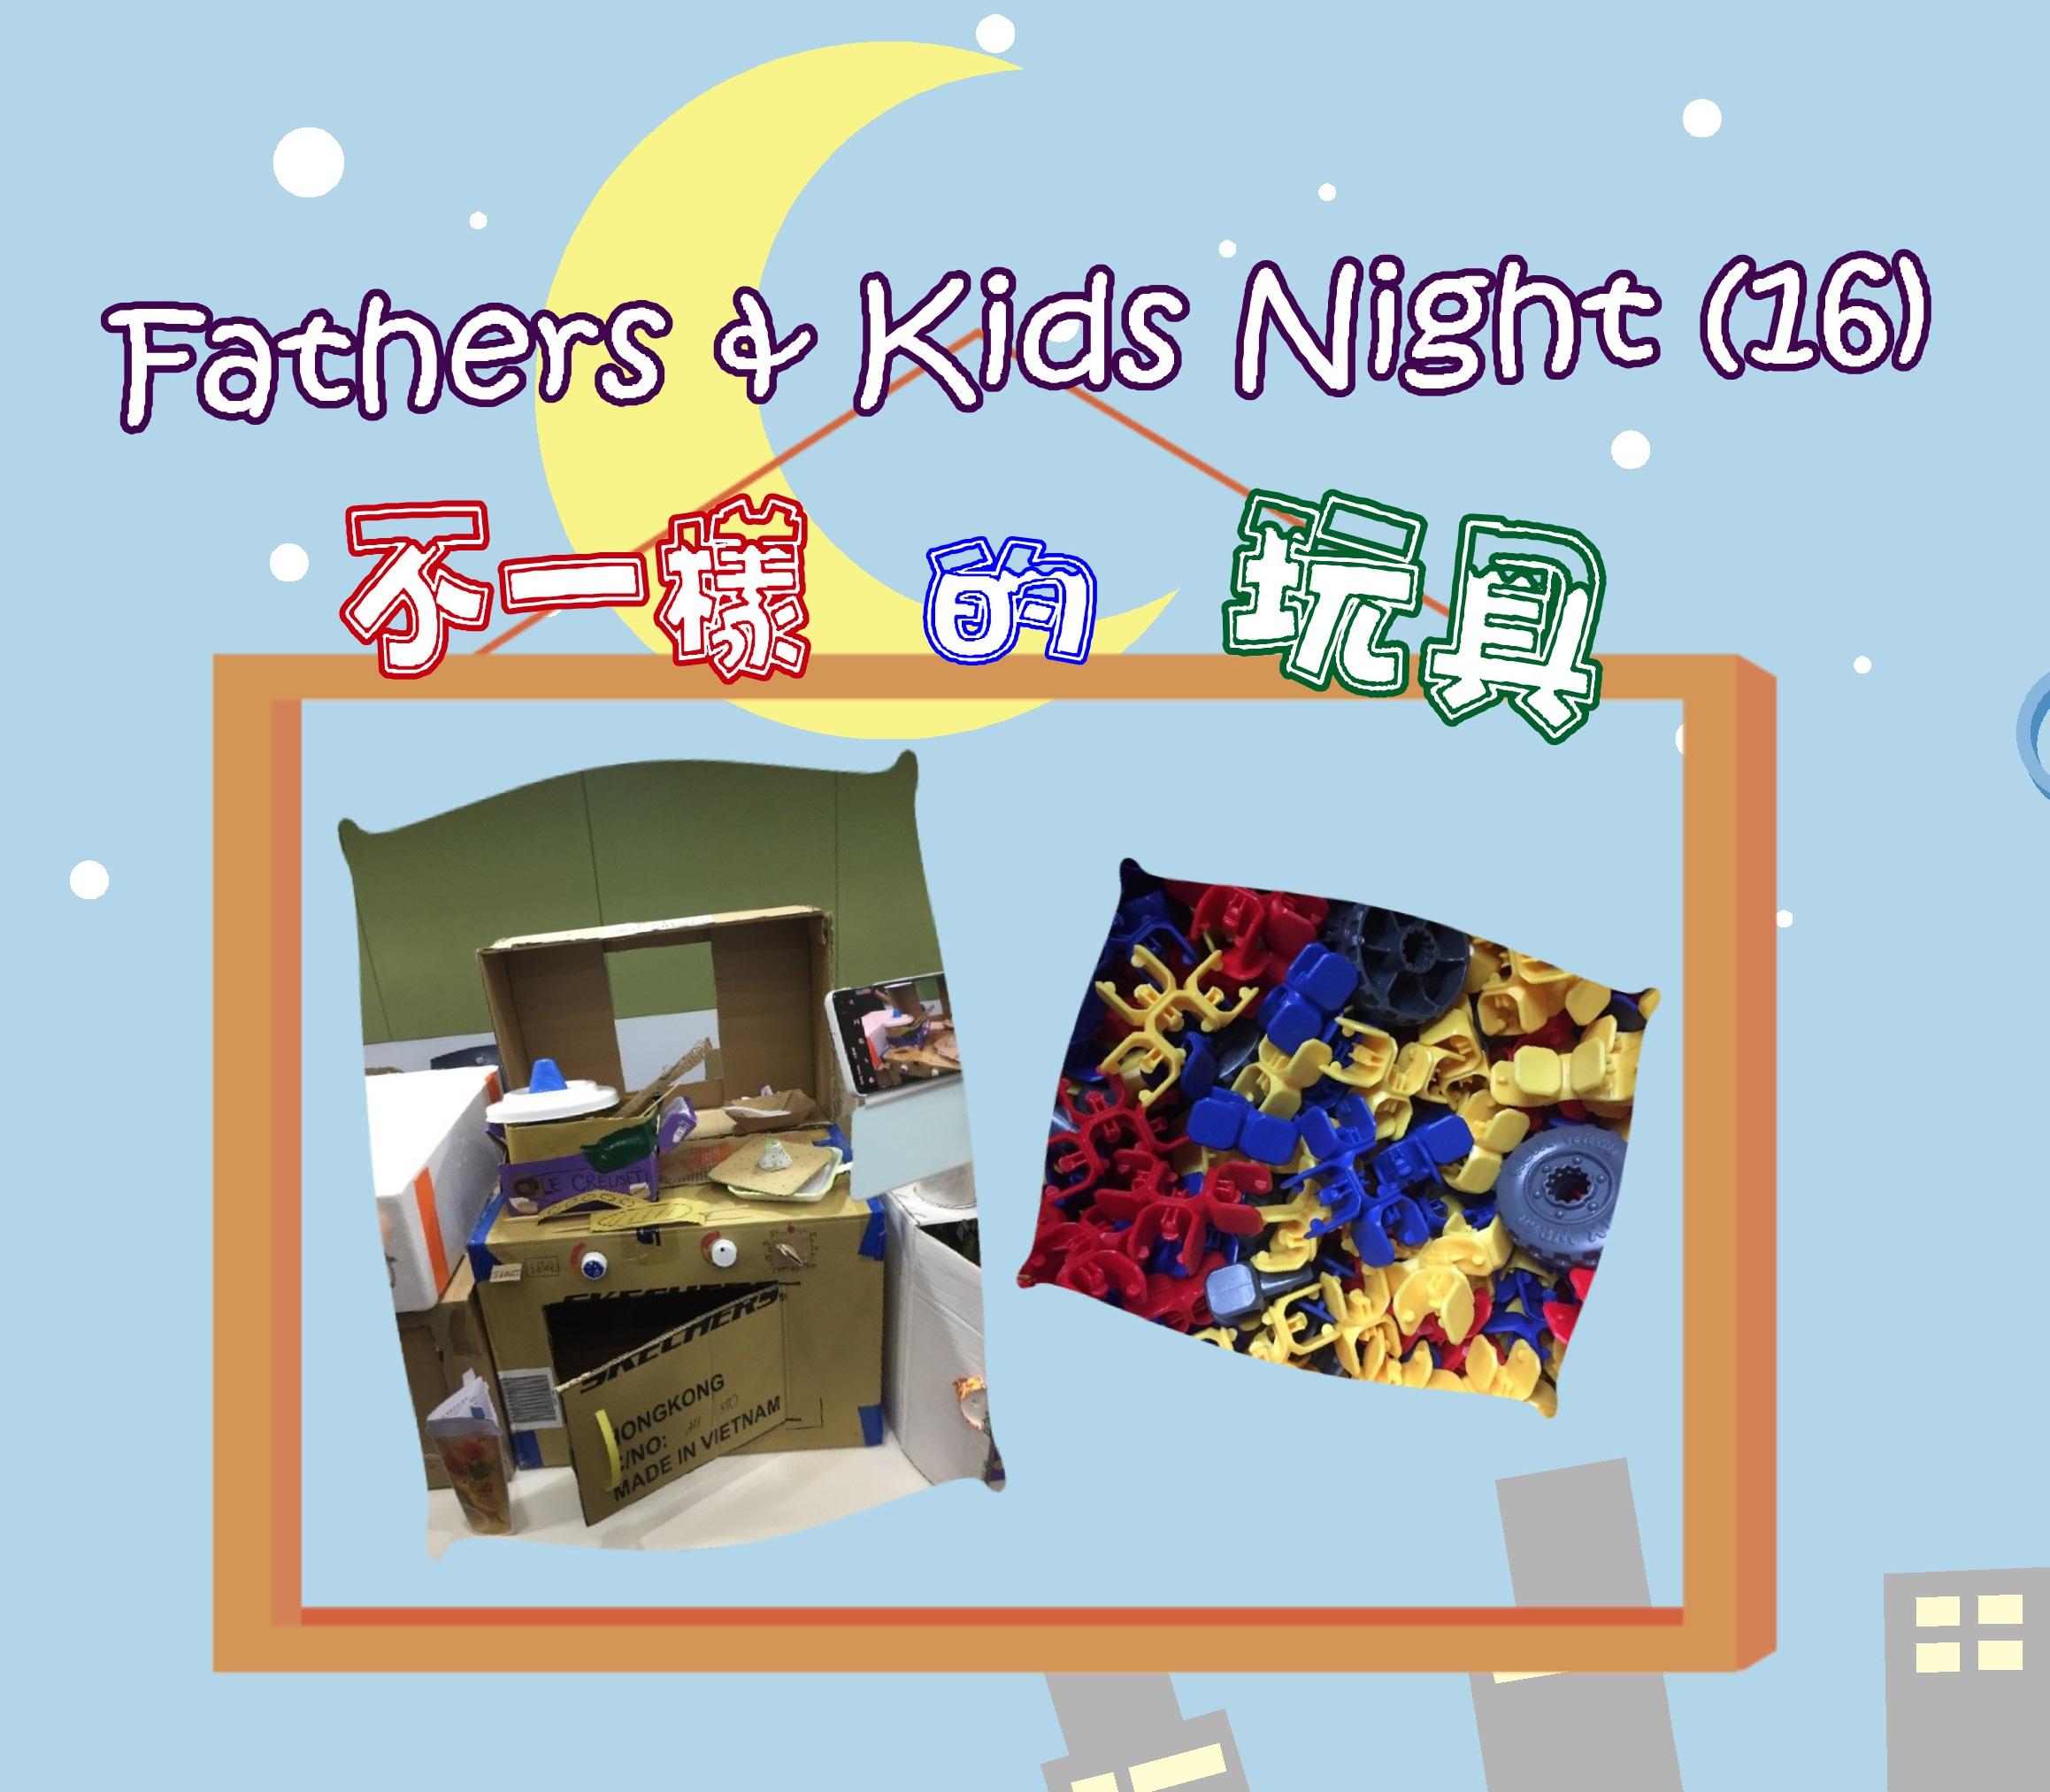 PT202108 Fathers & Kids Night(16)~不一樣的玩具 Image